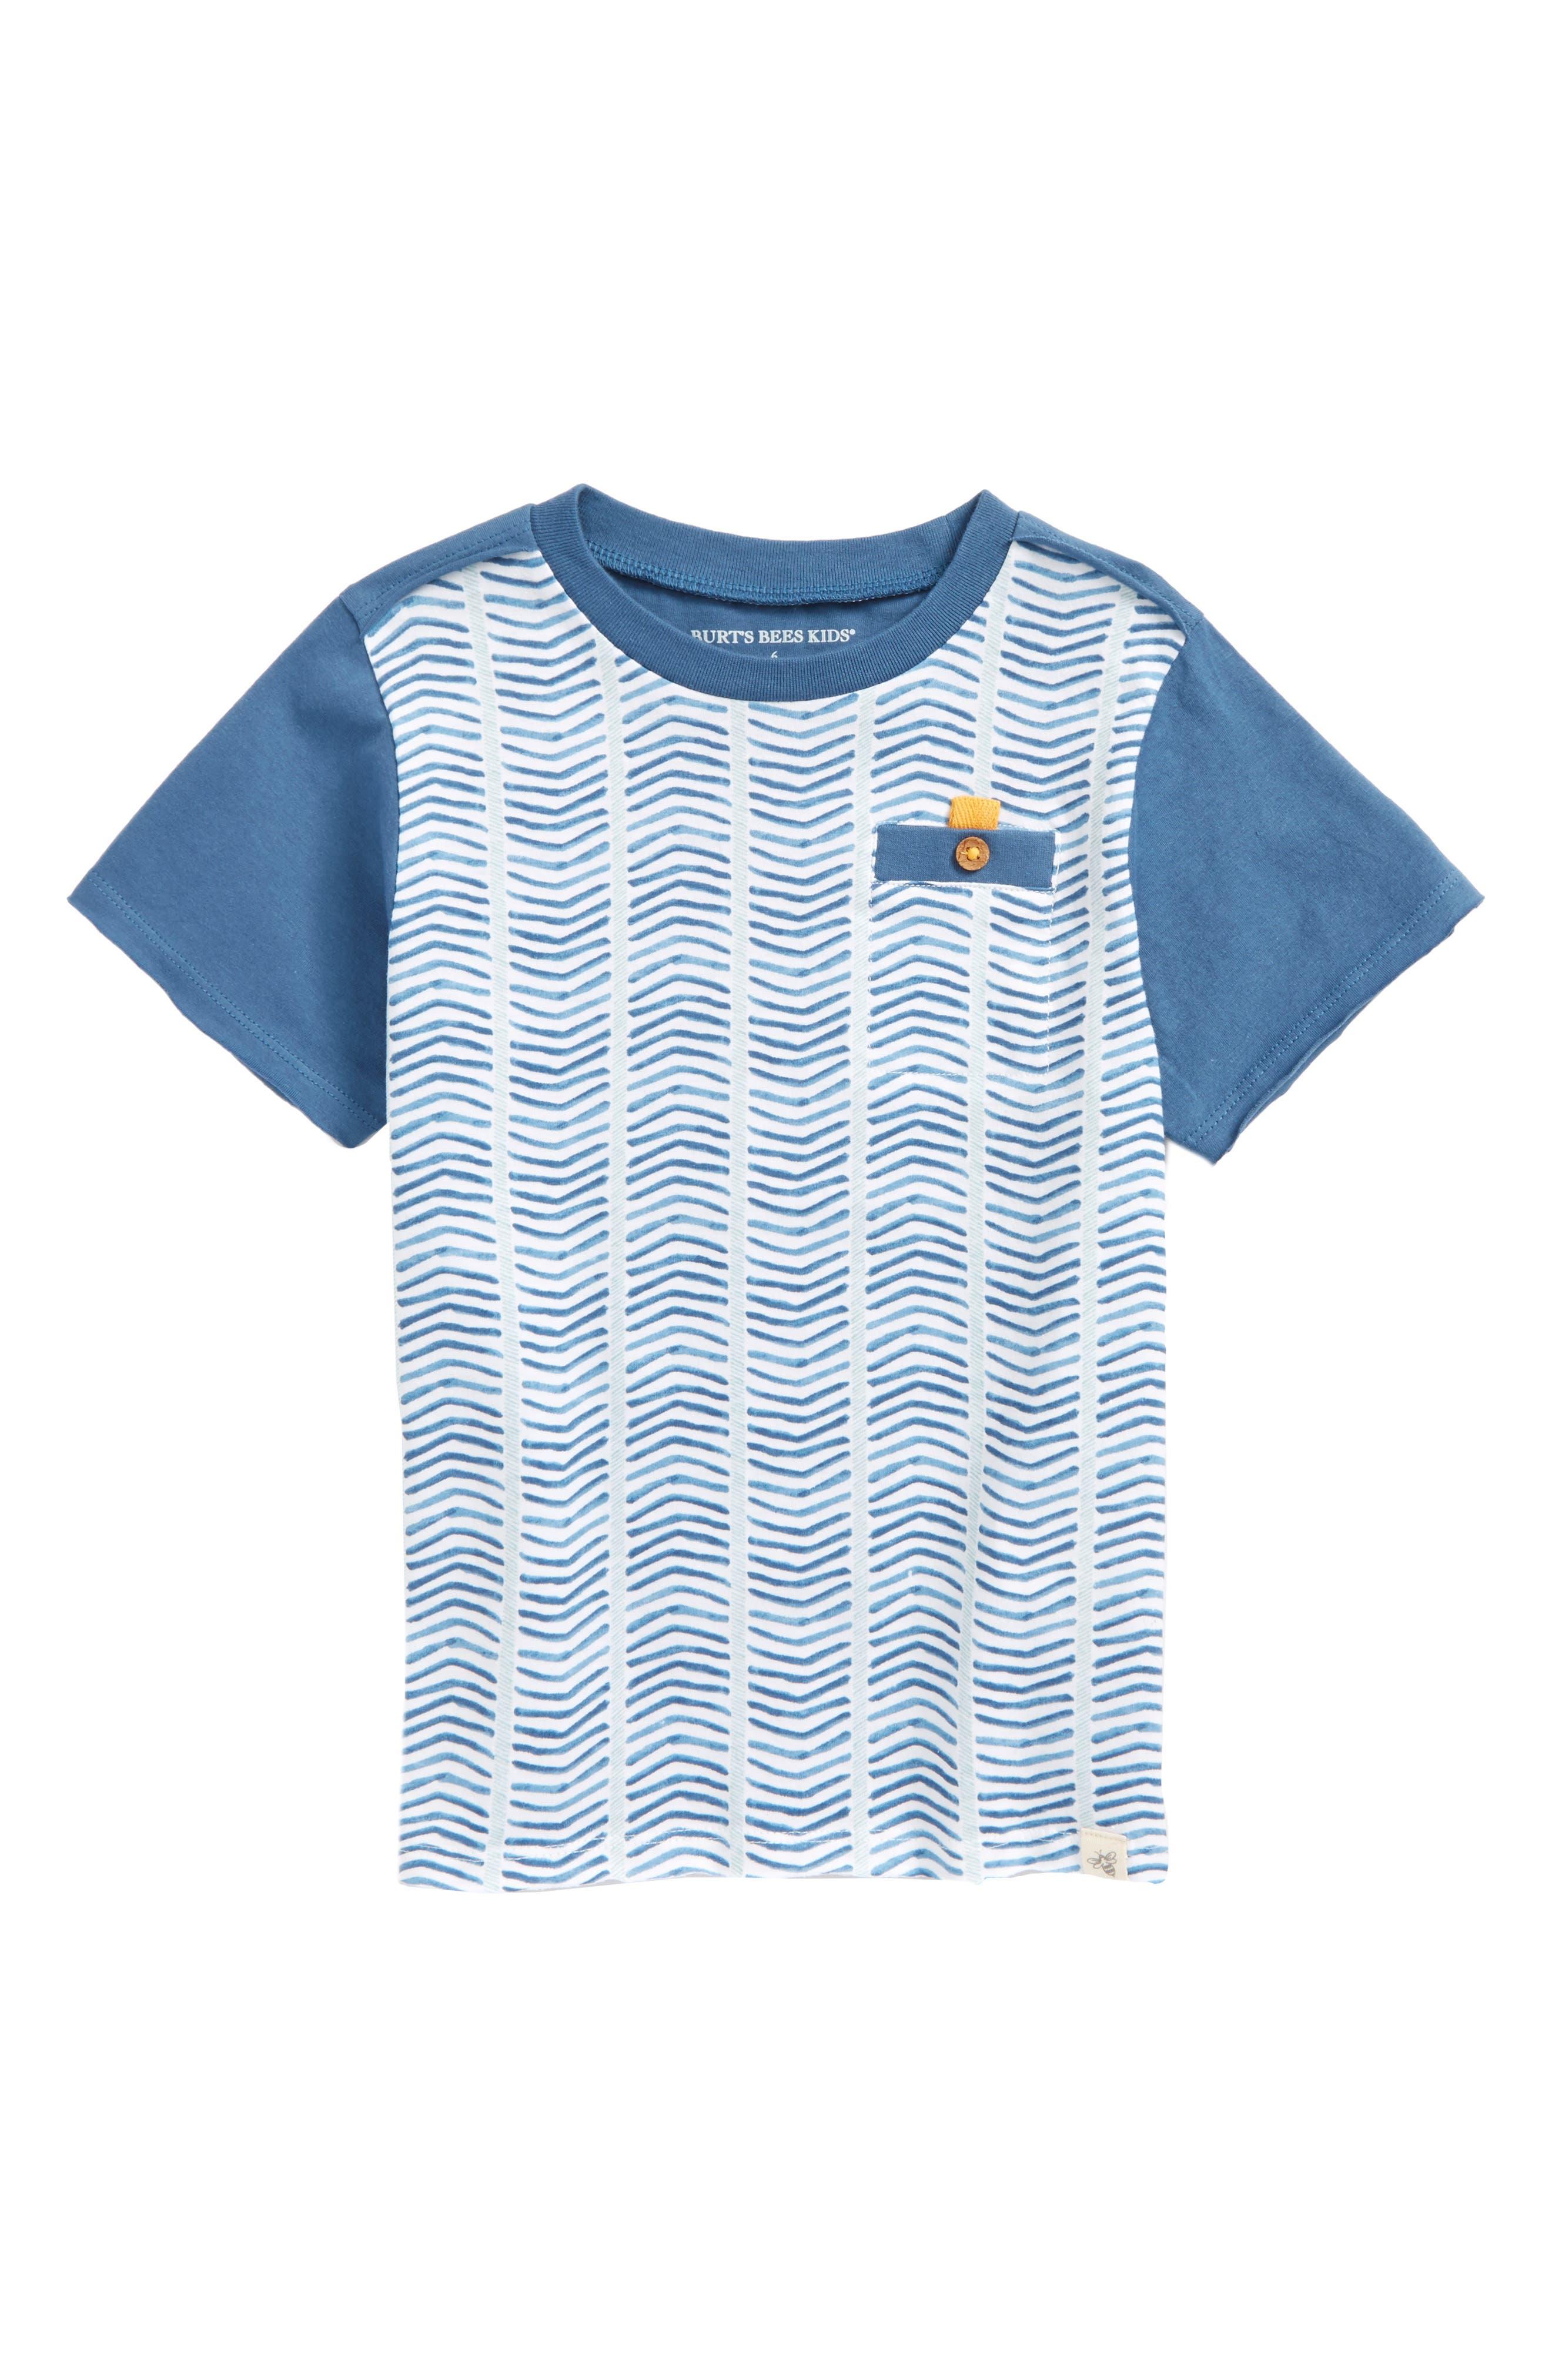 Main Image - Burt's Bees Baby Chevron Stripe Organic Cotton T-Shirt (Toddler Boys & Little Boys)